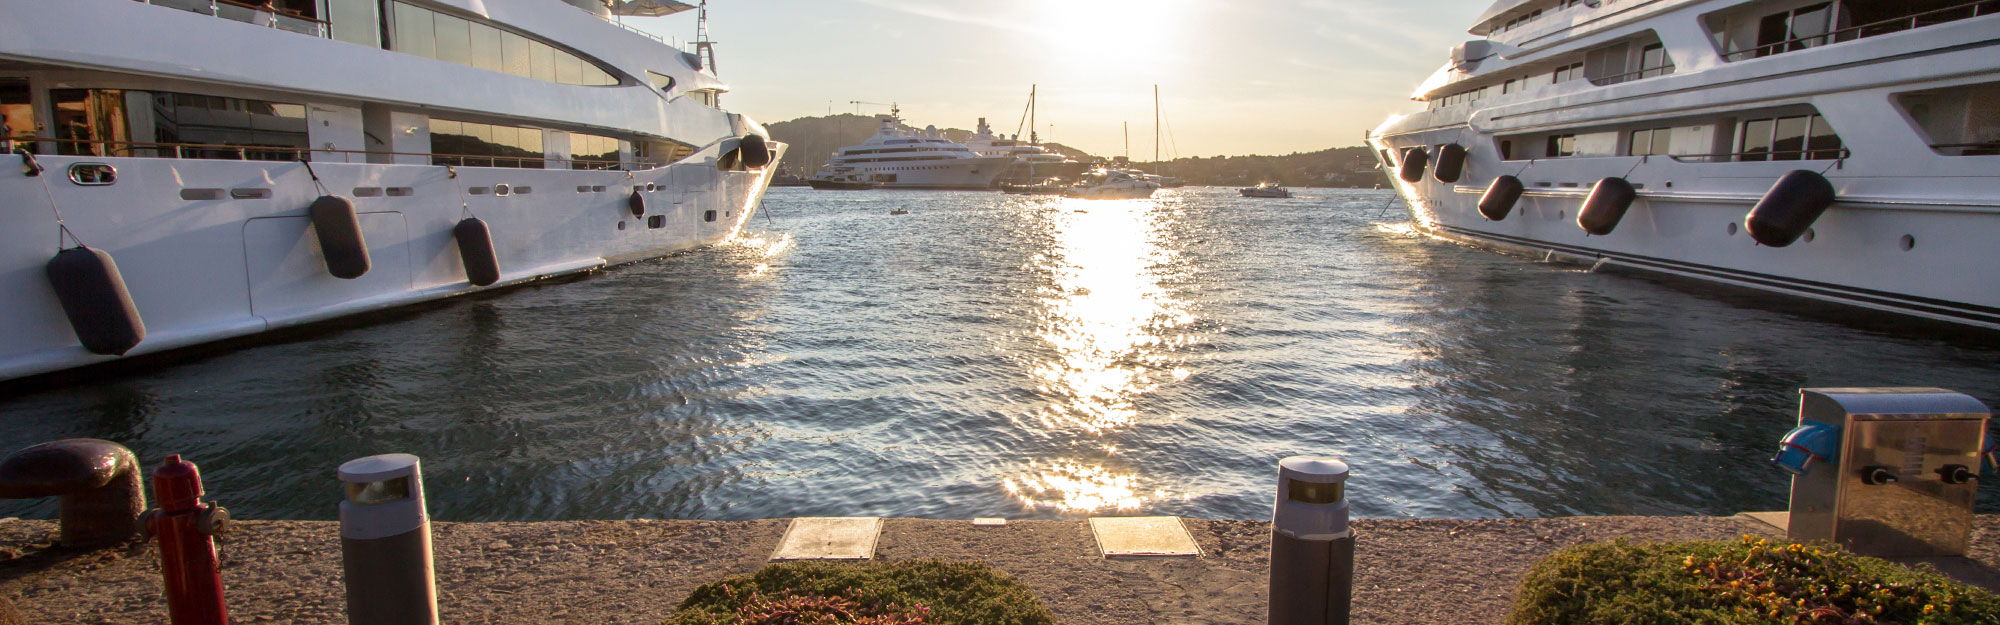 Yacht Berth Reservation Seastar Shipping